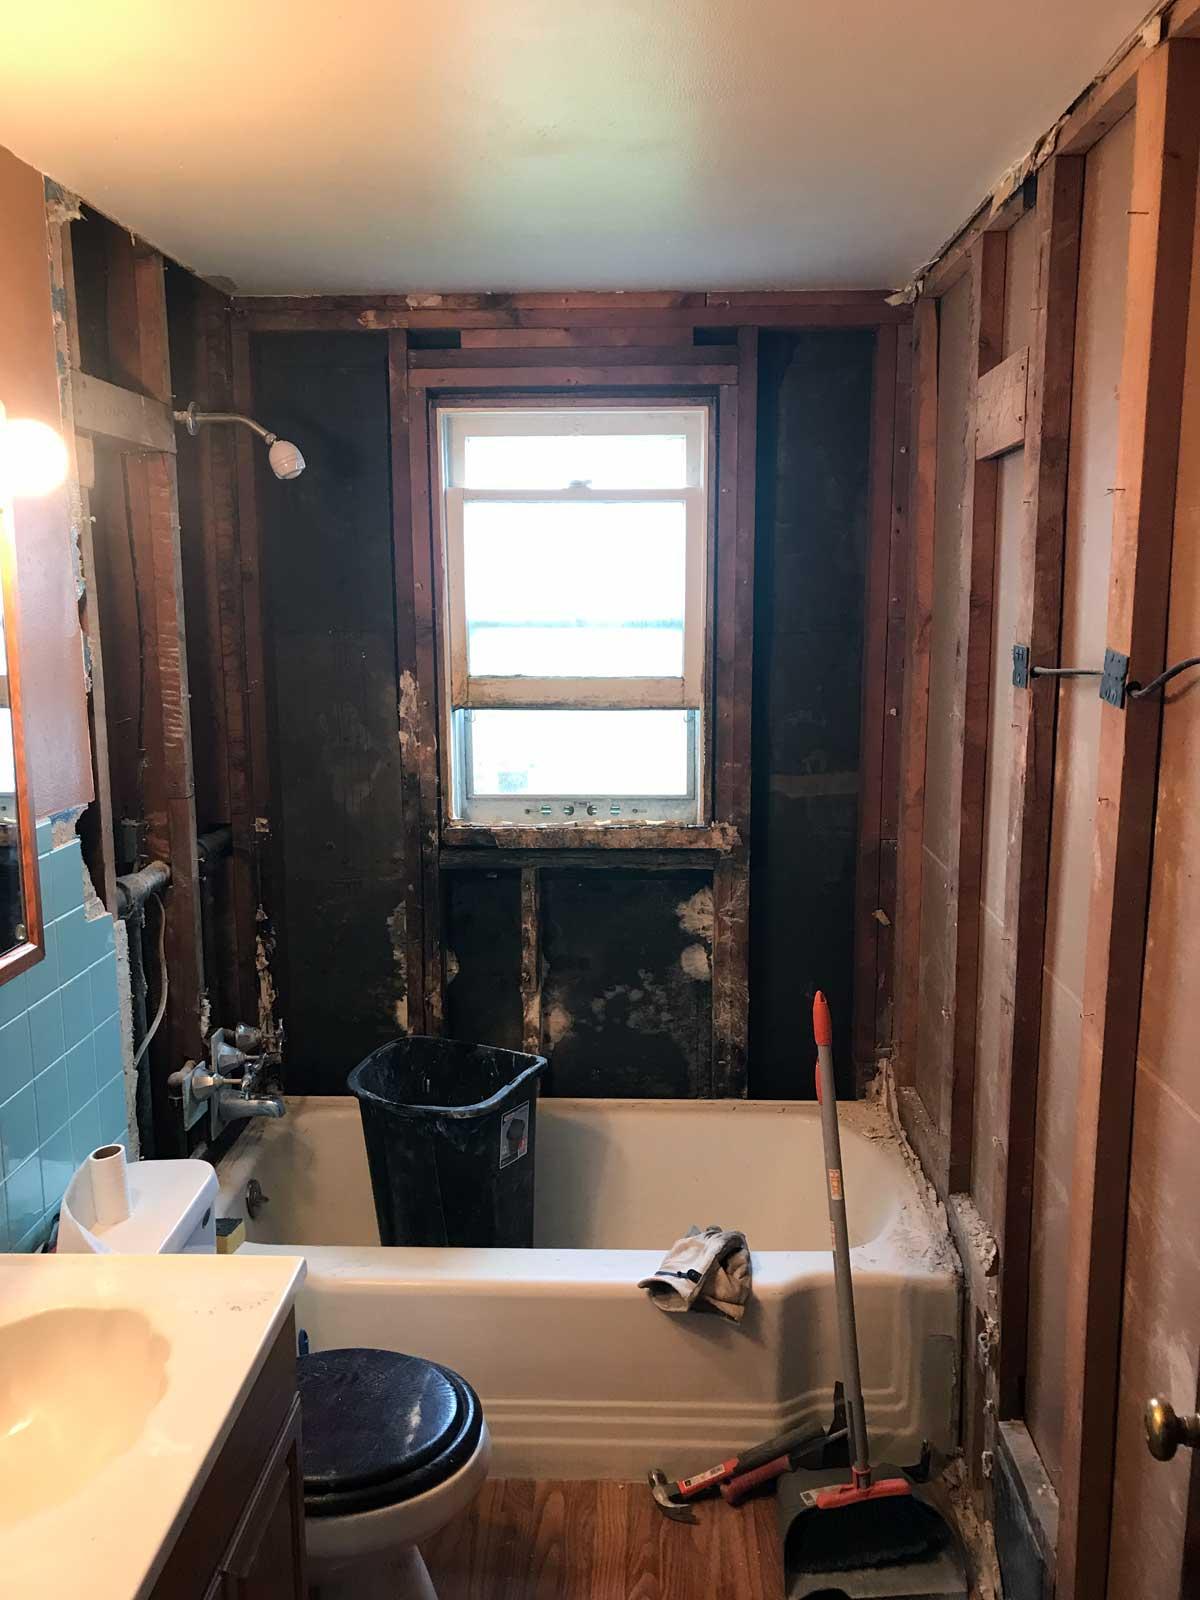 15-Day-Bathroom-Renovation-06.jpg